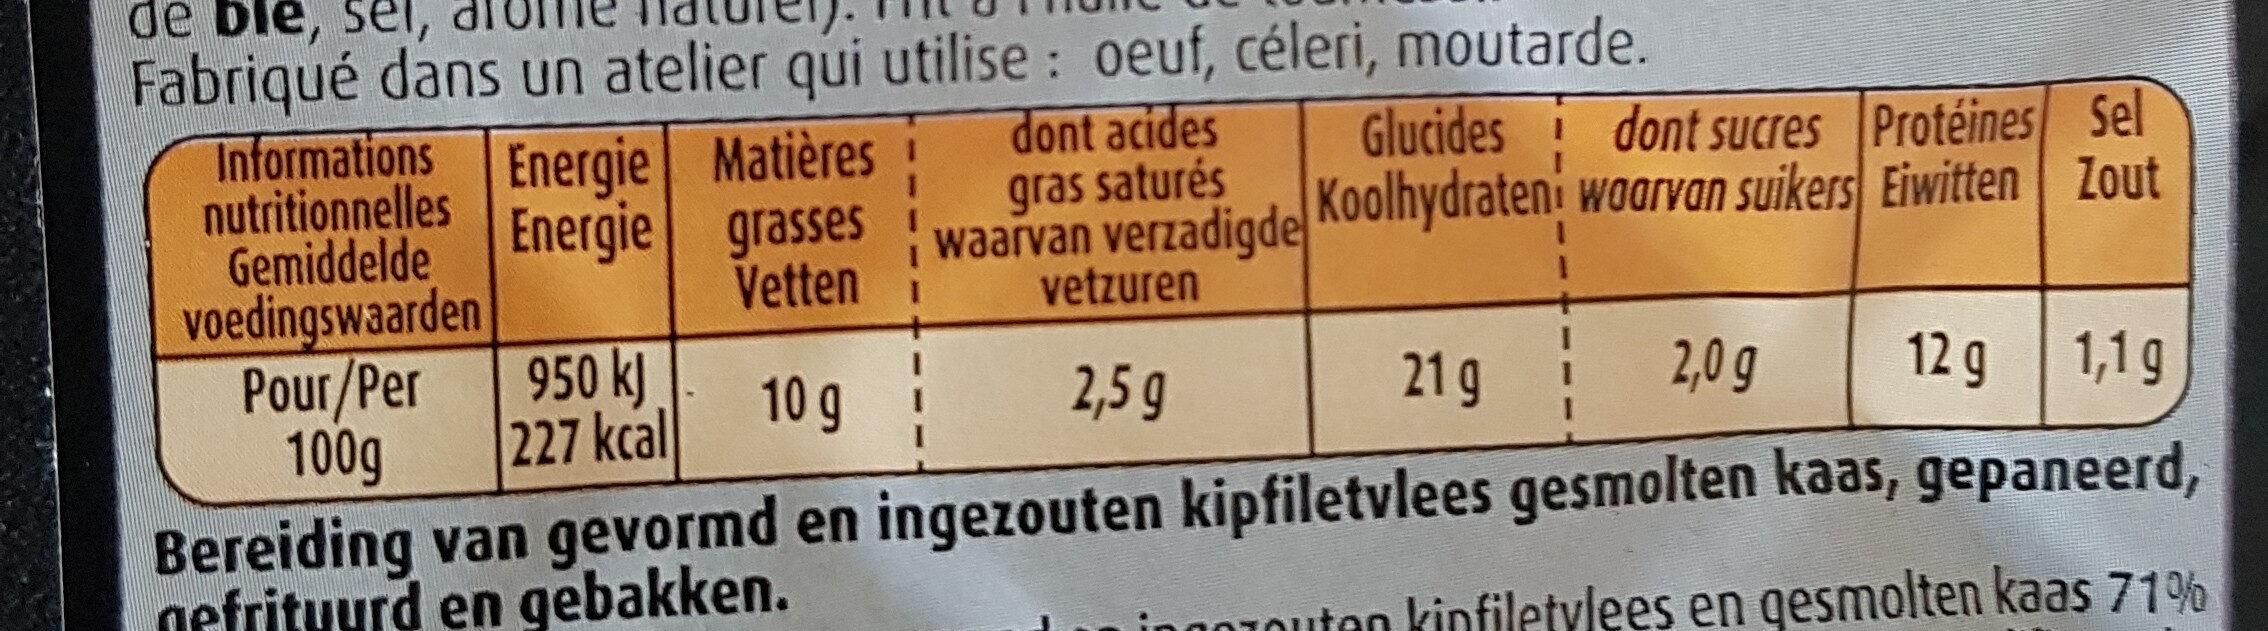 Donuts de poulet 800g - Voedingswaarden - fr